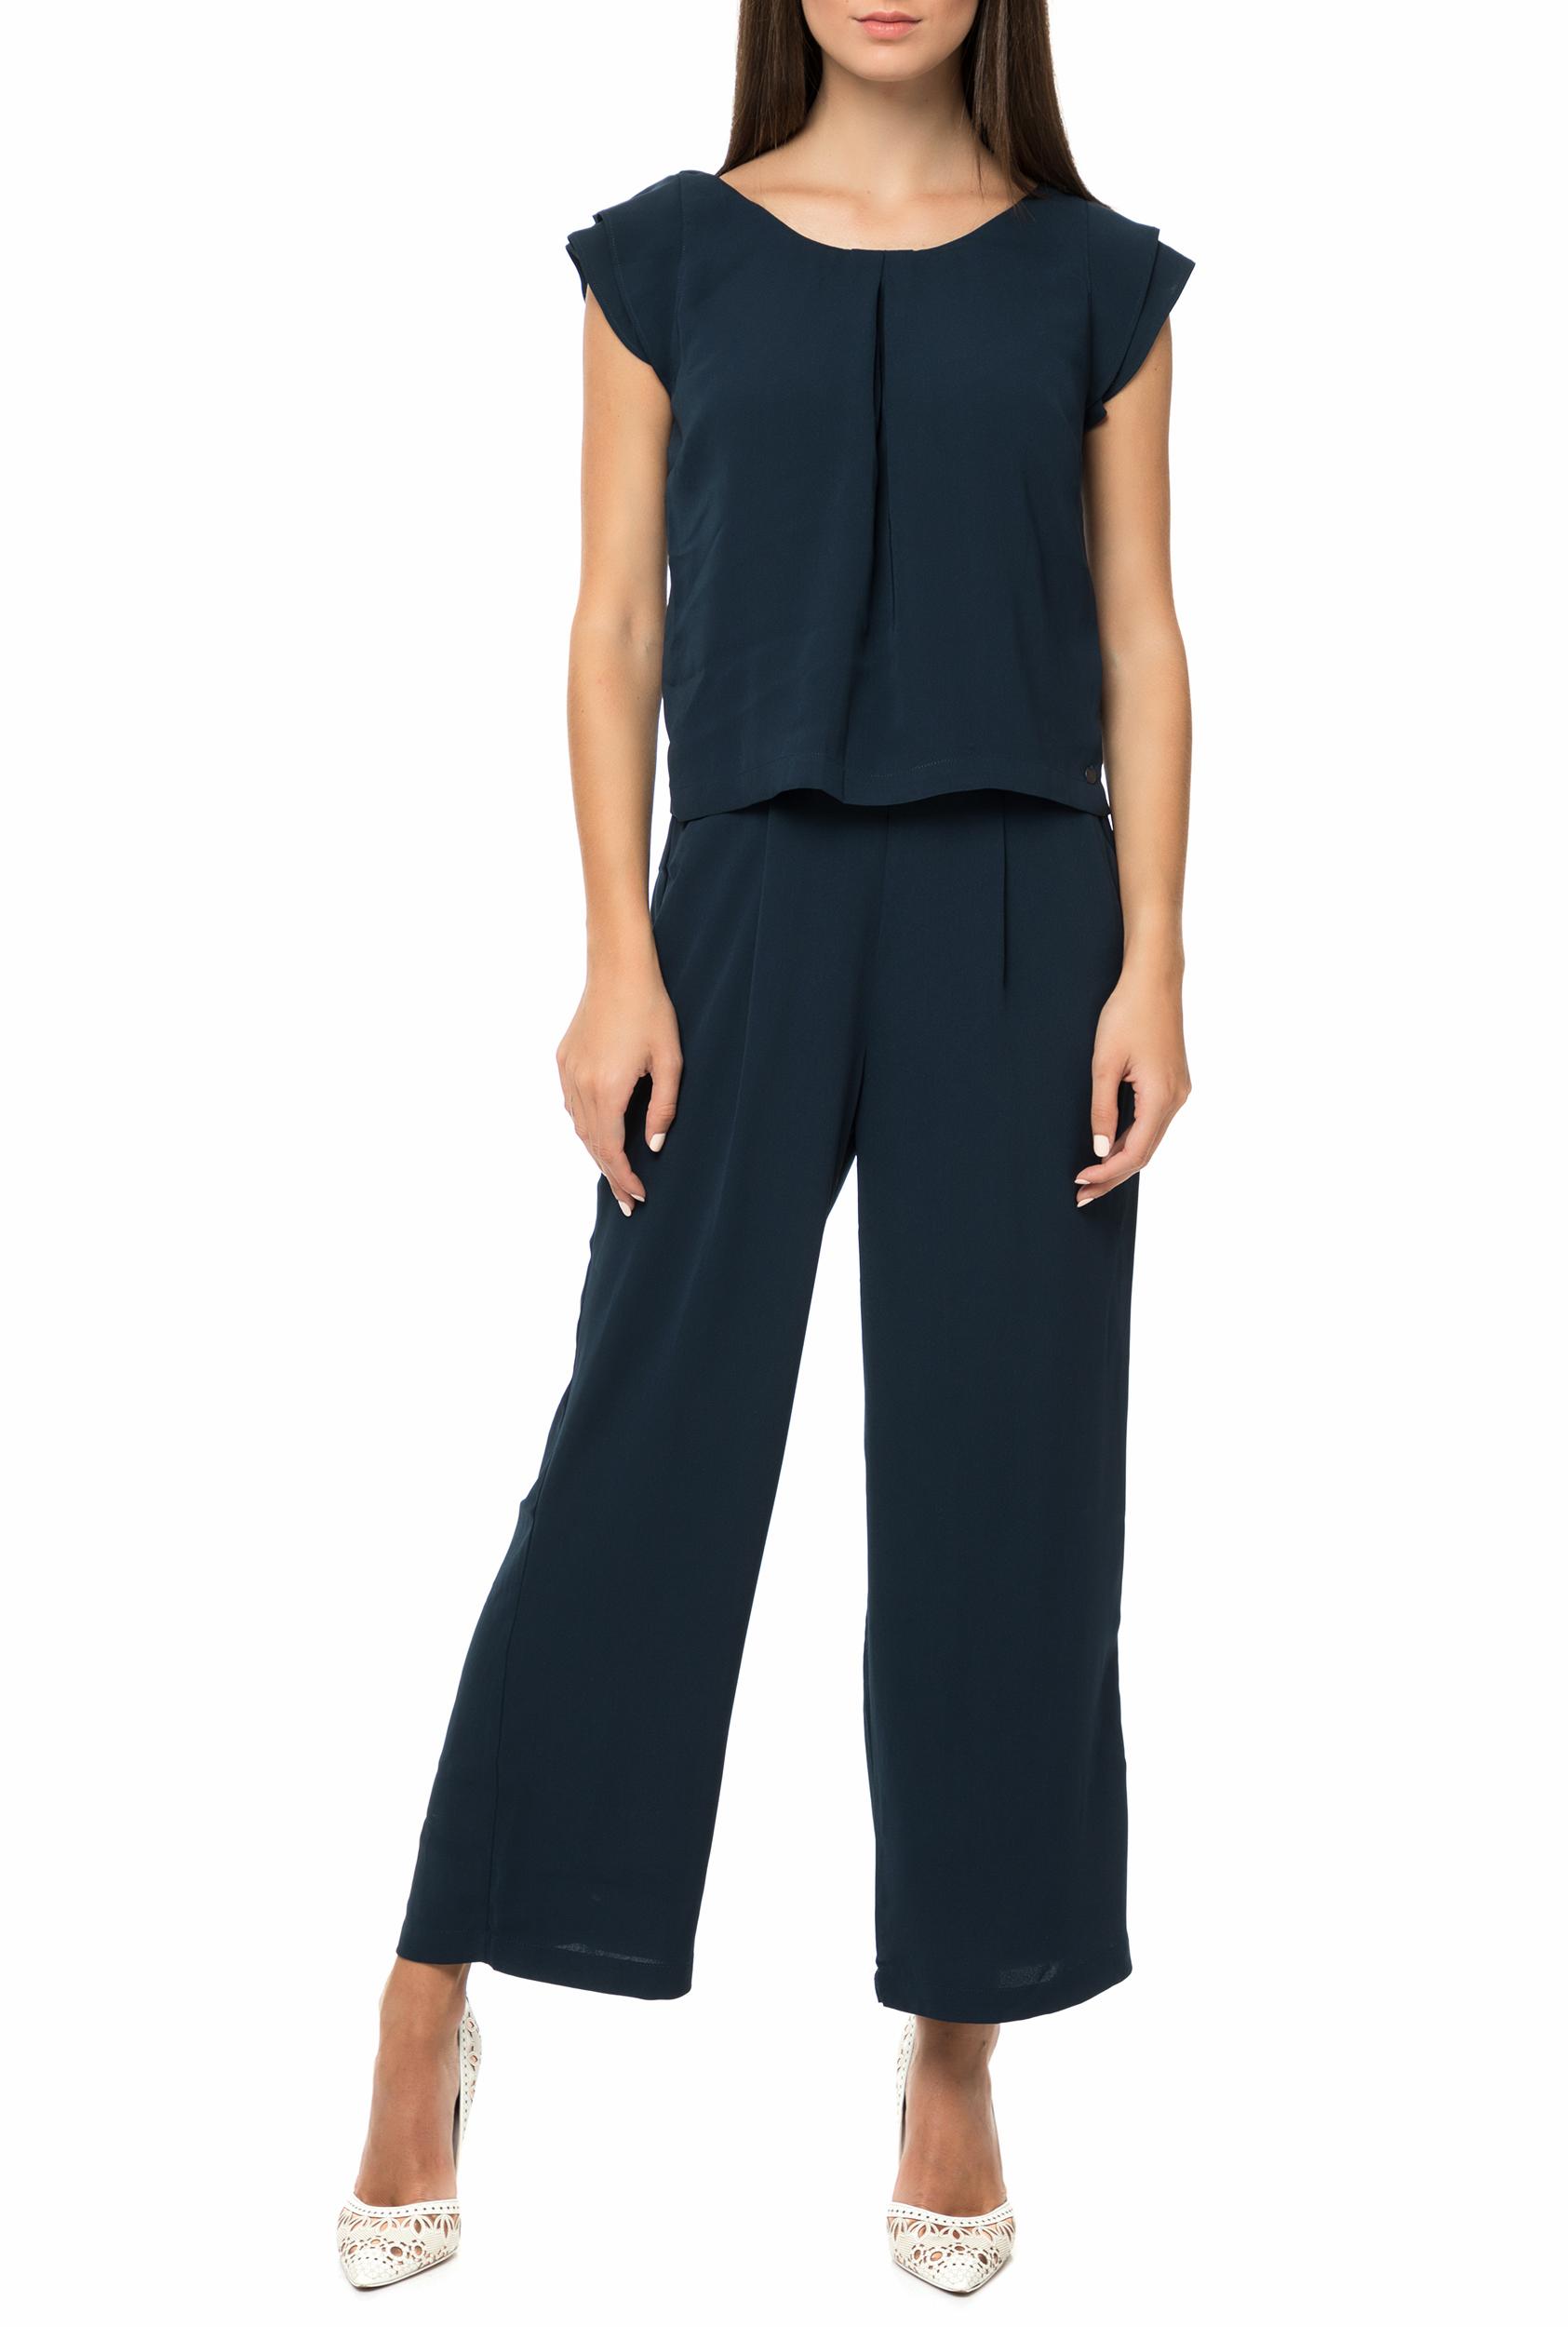 NUMPH - Γυναικεία ολόσωμη φόρμα NUMPH μπλε γυναικεία ρούχα ολόσωμες φόρμες